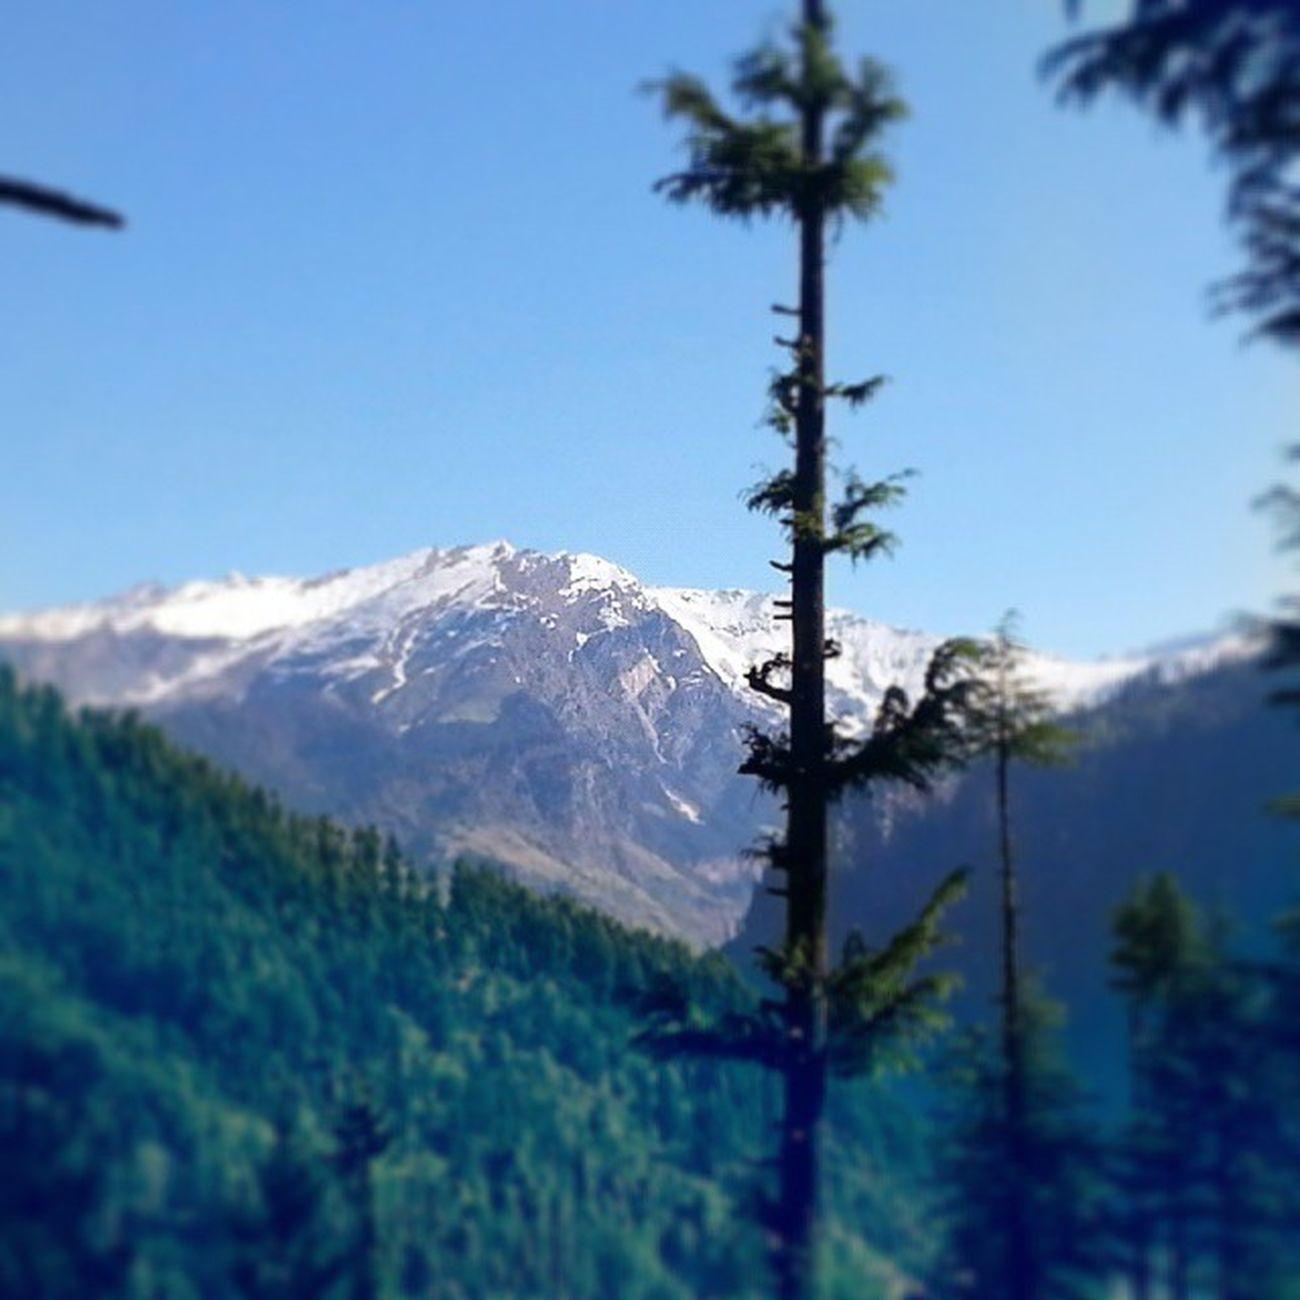 Dawn Himalayarange Chillmorning Selfphotography Selfwork Mobilephotography